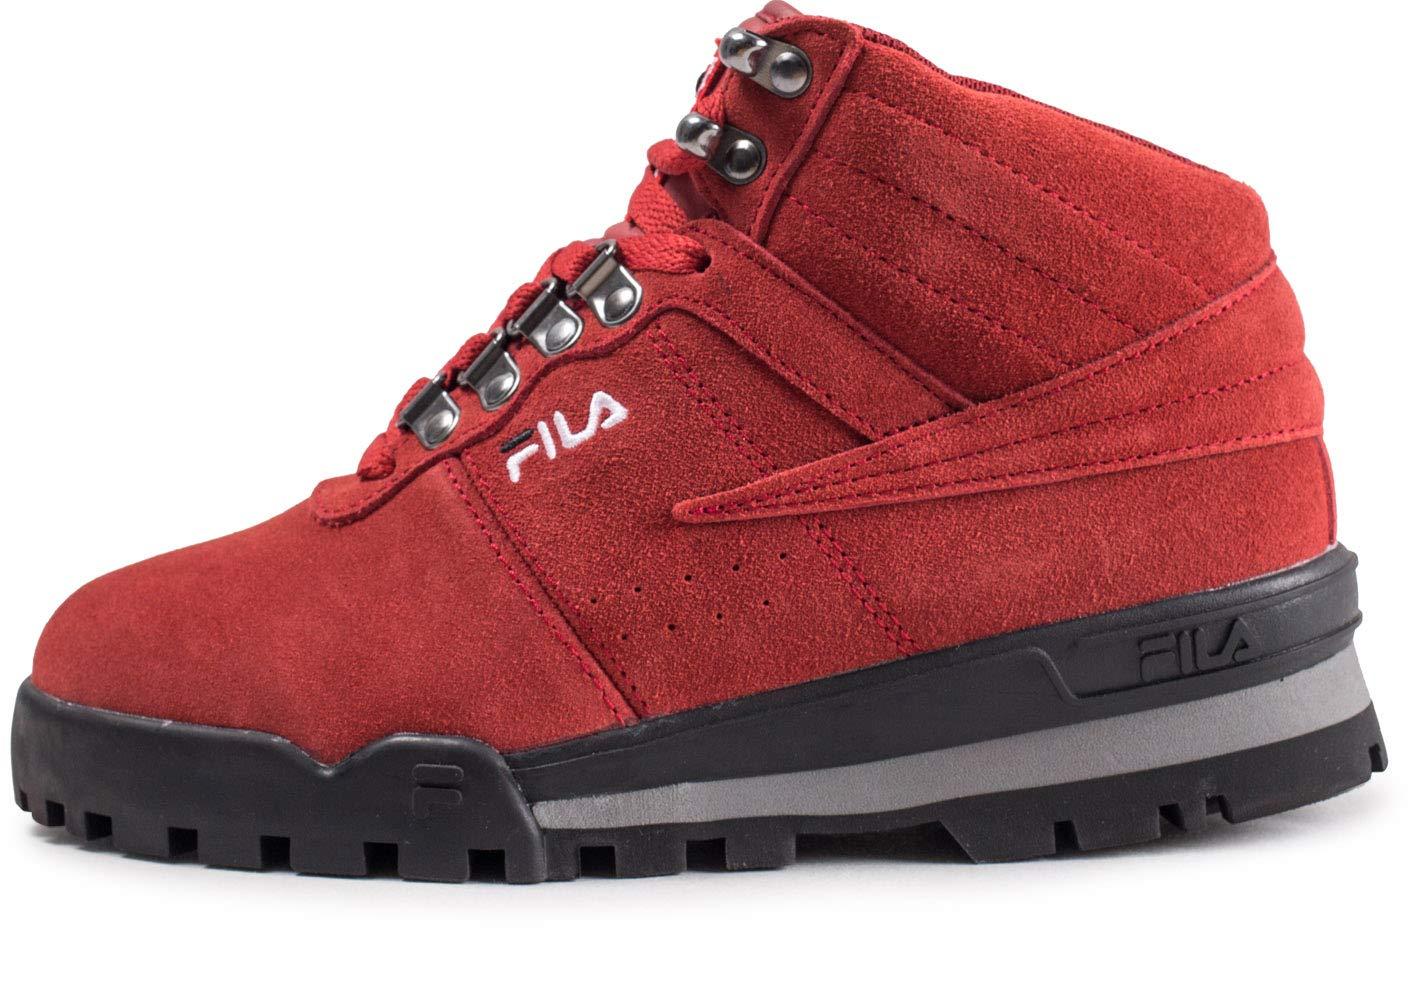 Fila Fitness Hiker Mid Wn's Pompeian rosso 10104354VK, Stivali - 39 EU